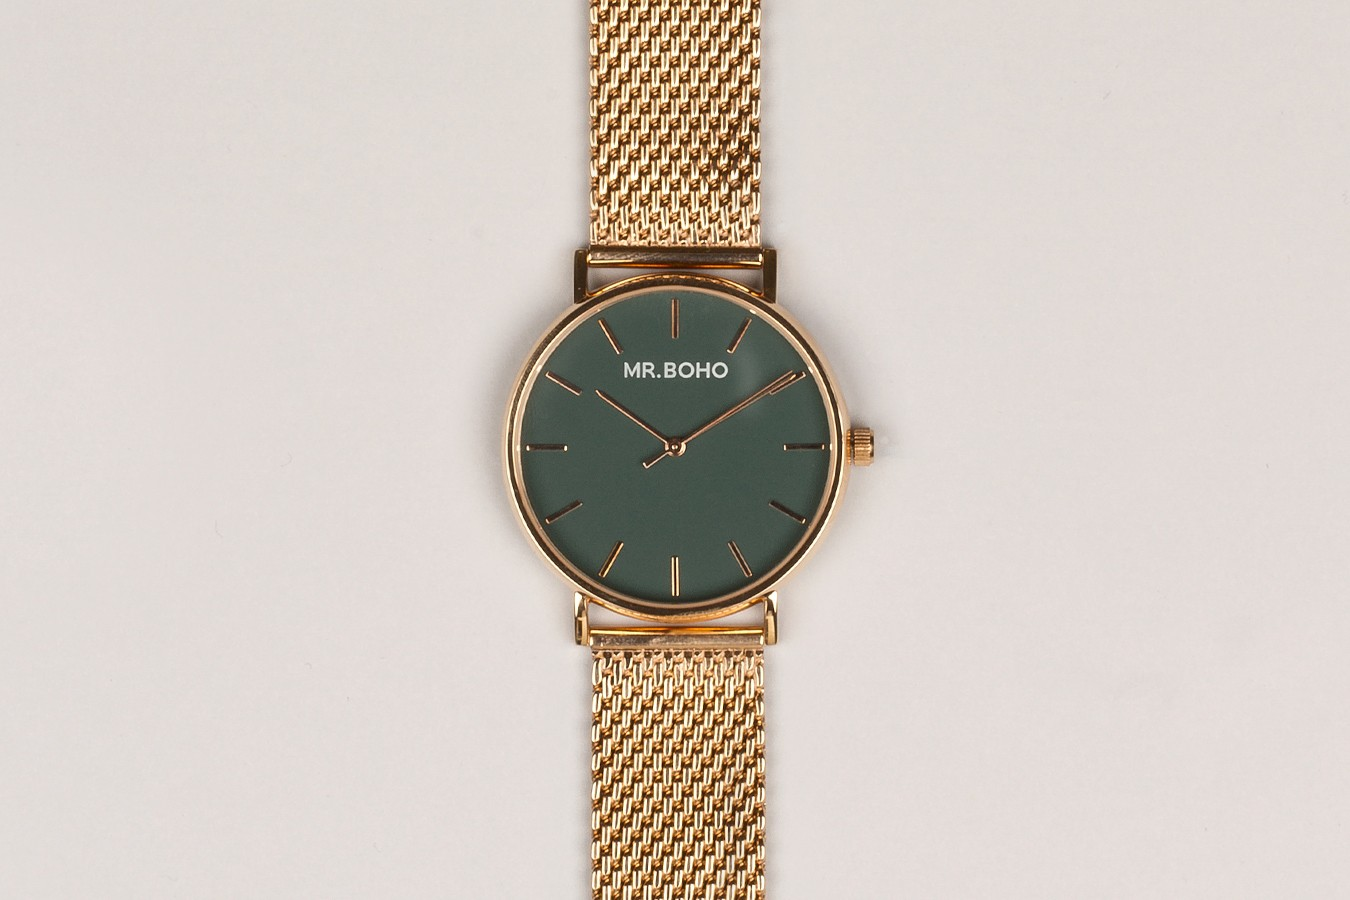 Green Metallic Copper - Watches   Mr. Boho